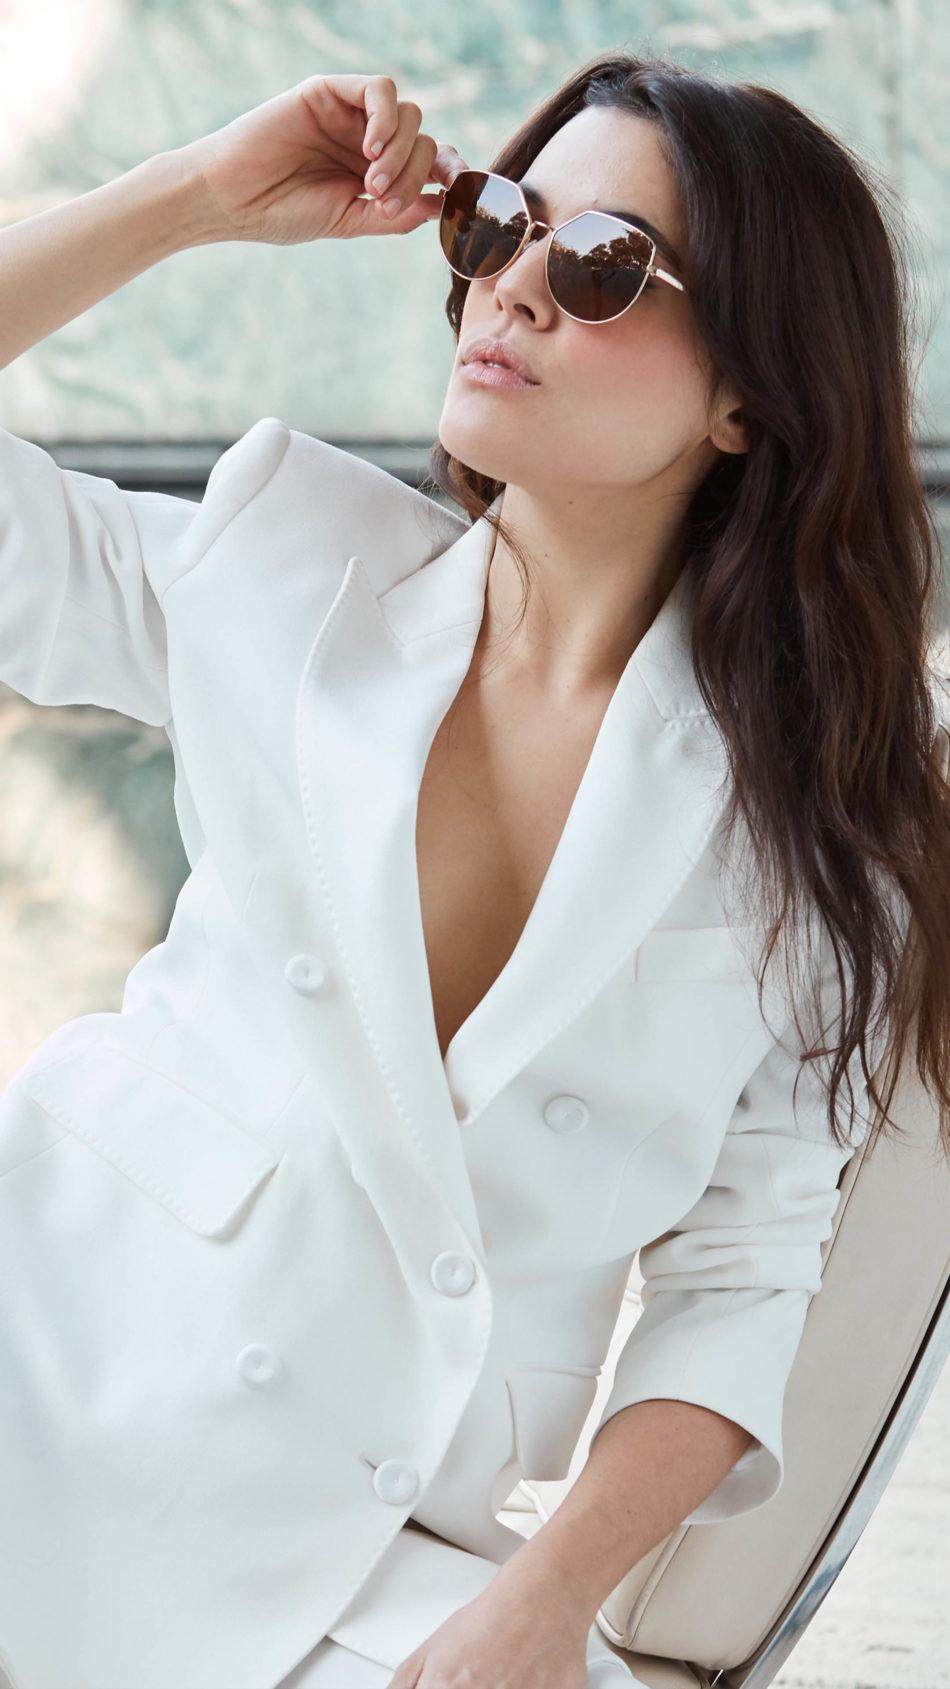 Adriana Ugarte White Dress Photoshoot 4K Ultra HD Mobile Wallpaper